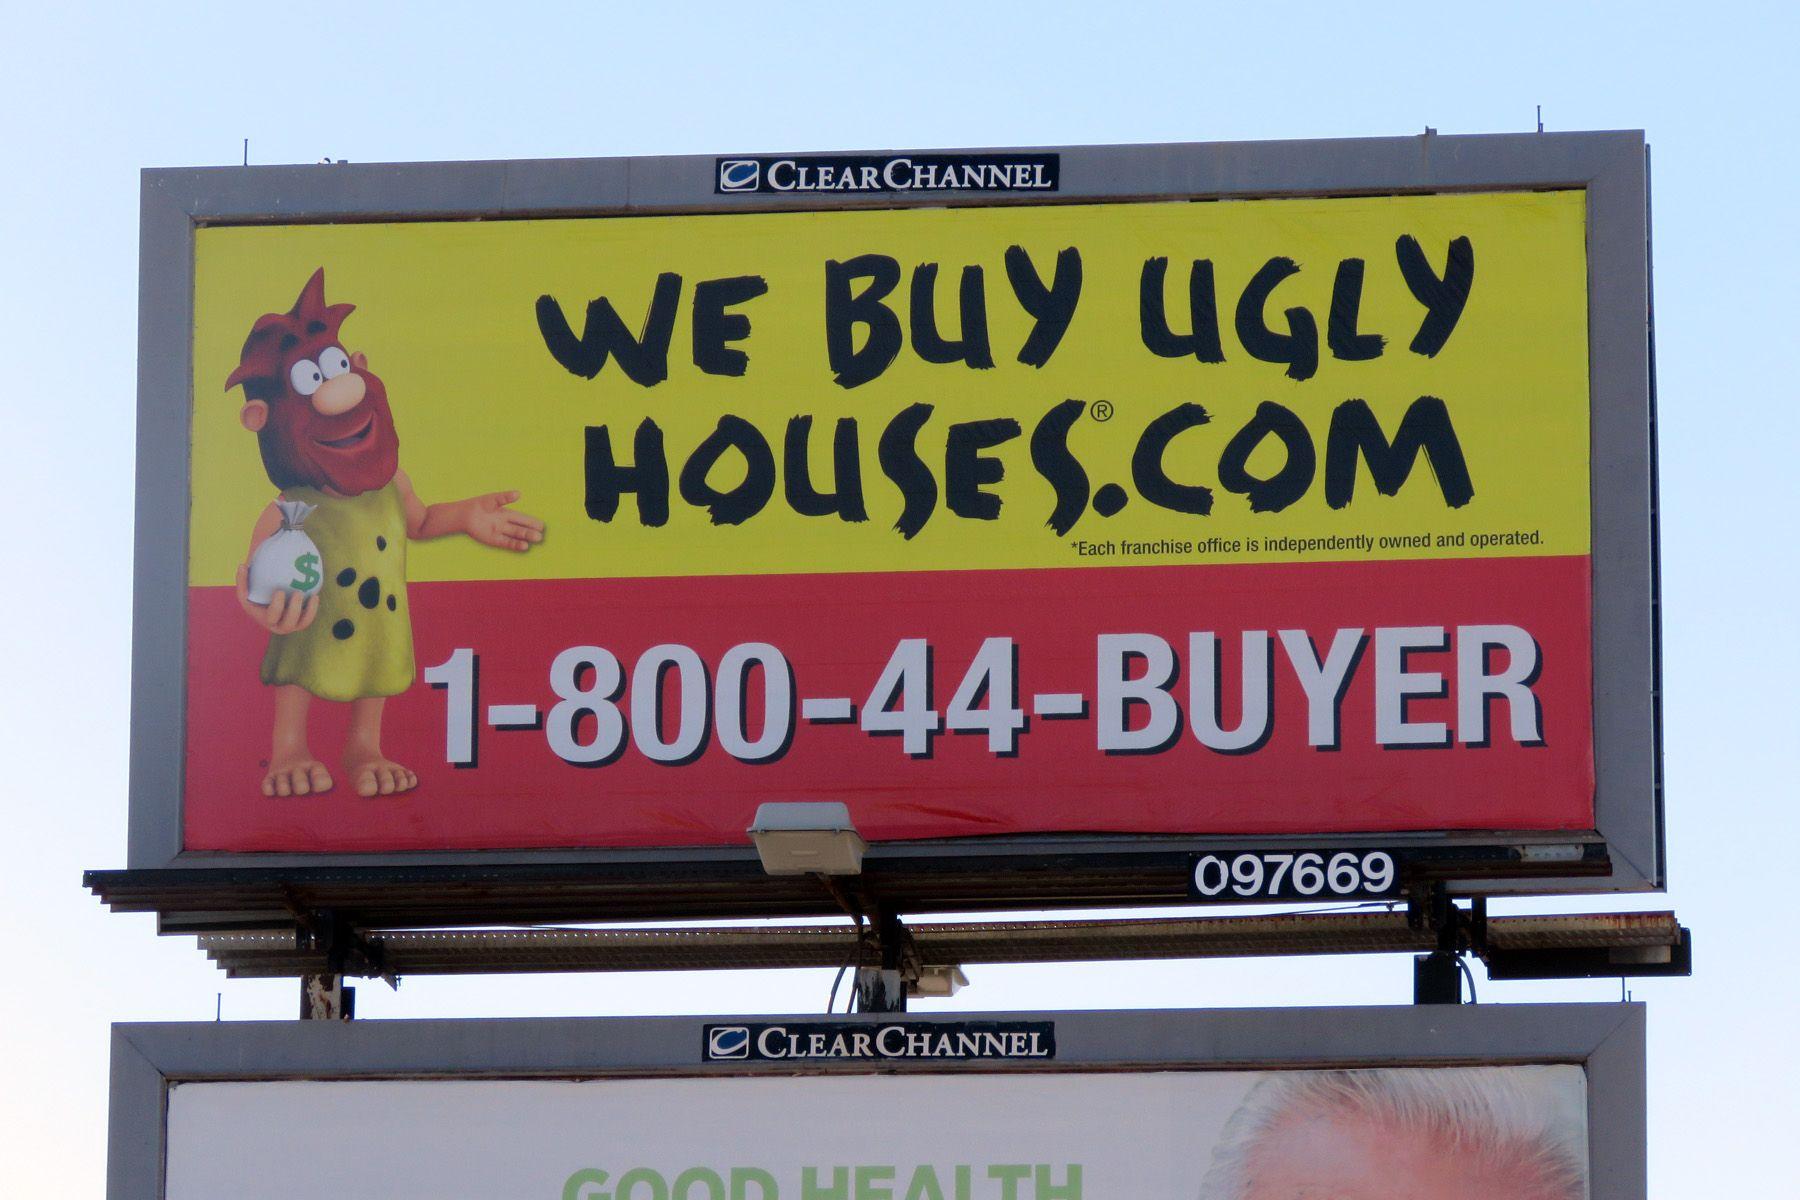 We Buy Ugly Houses.com